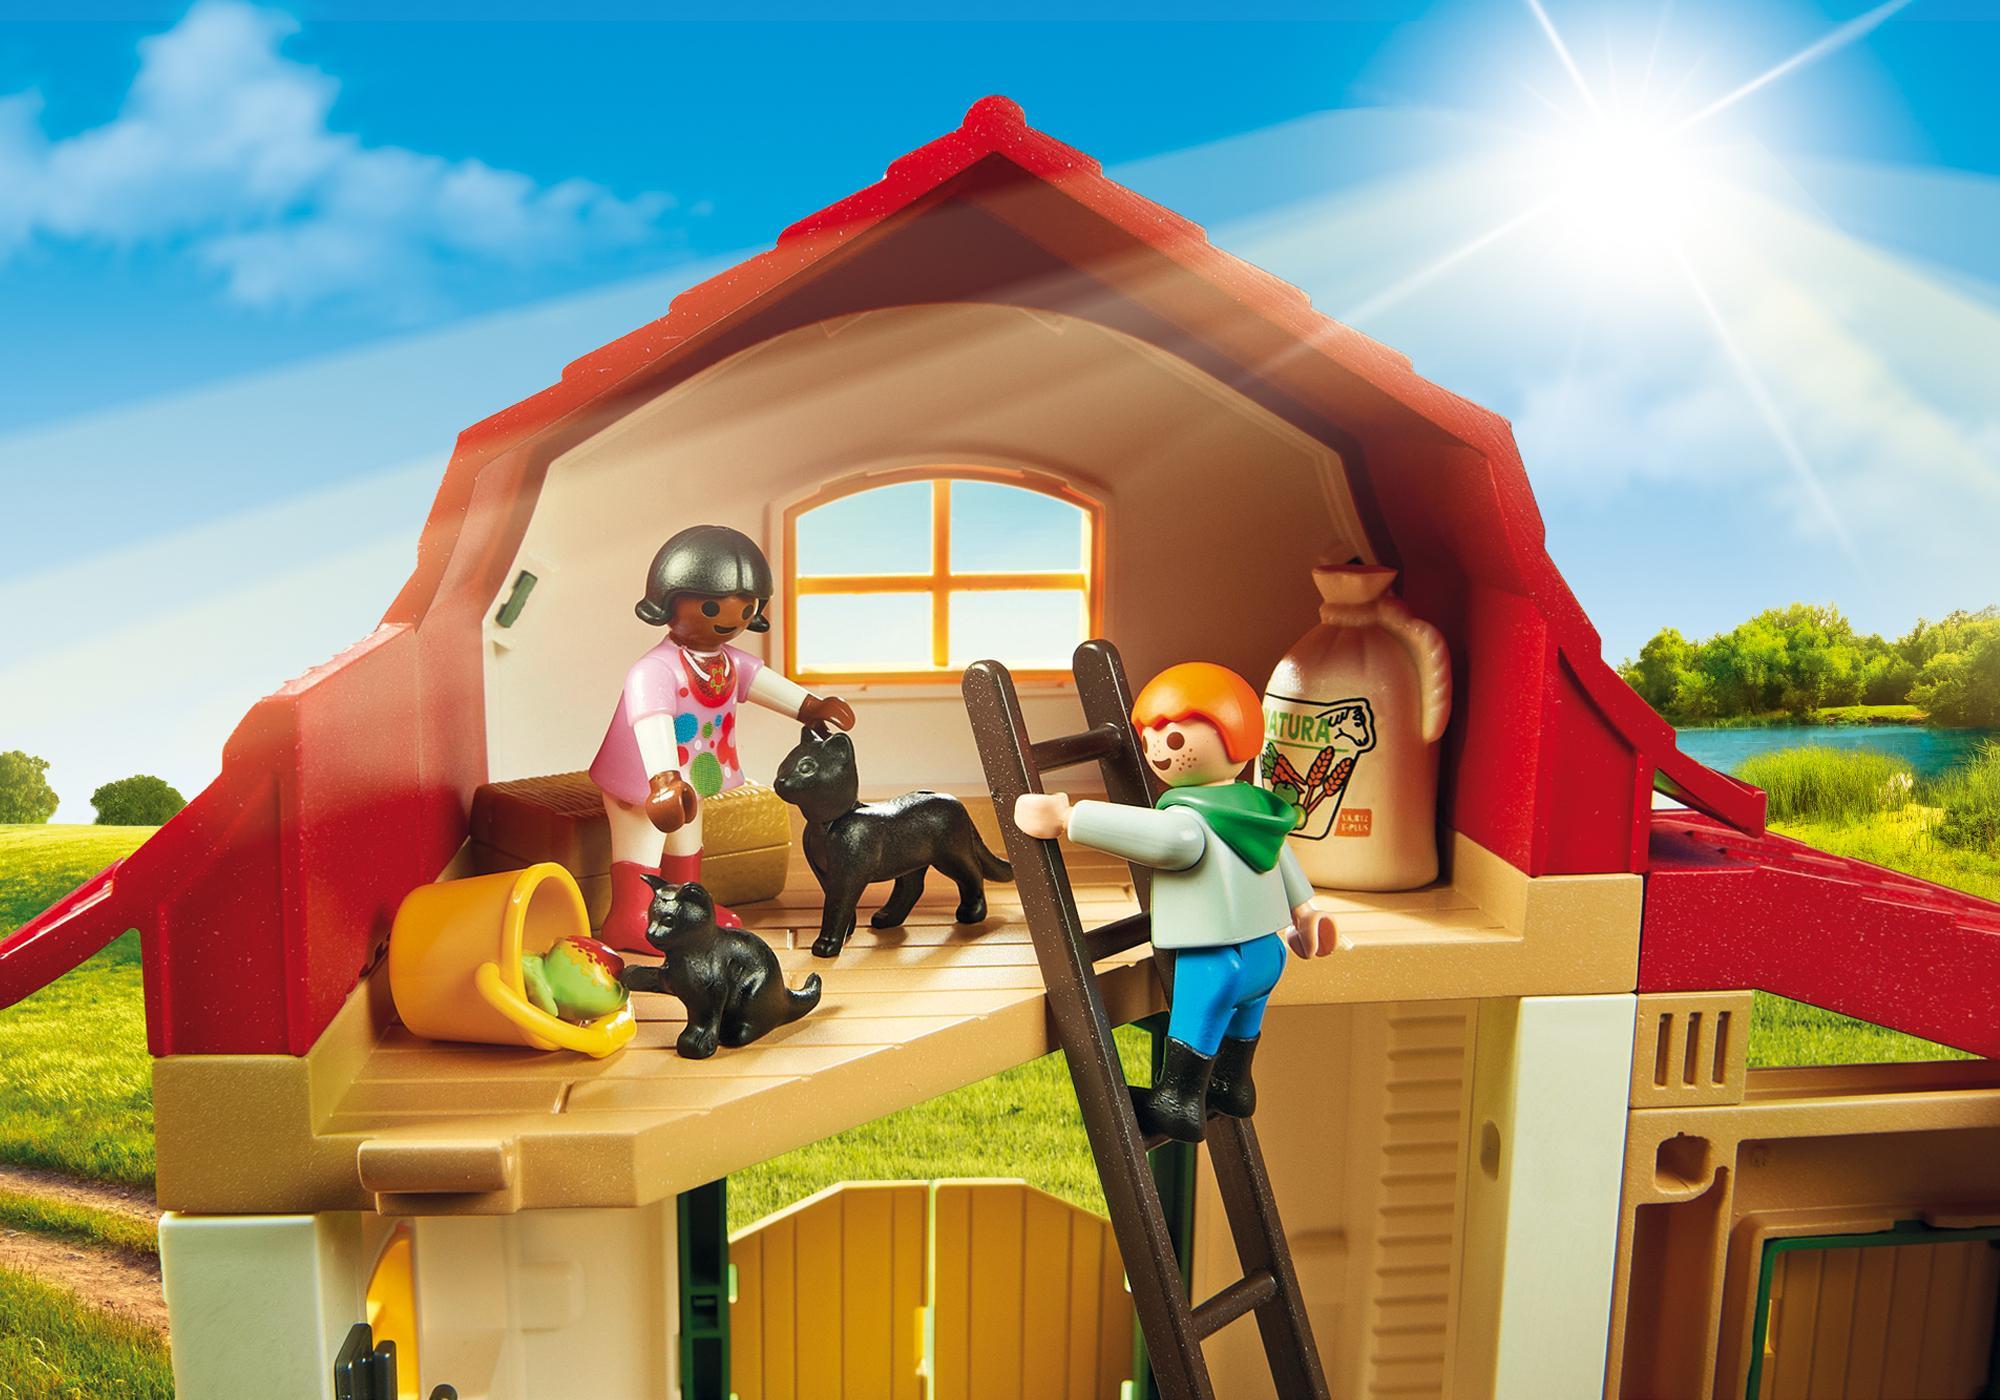 http://media.playmobil.com/i/playmobil/6927_product_extra1/Maneggio dei Pony